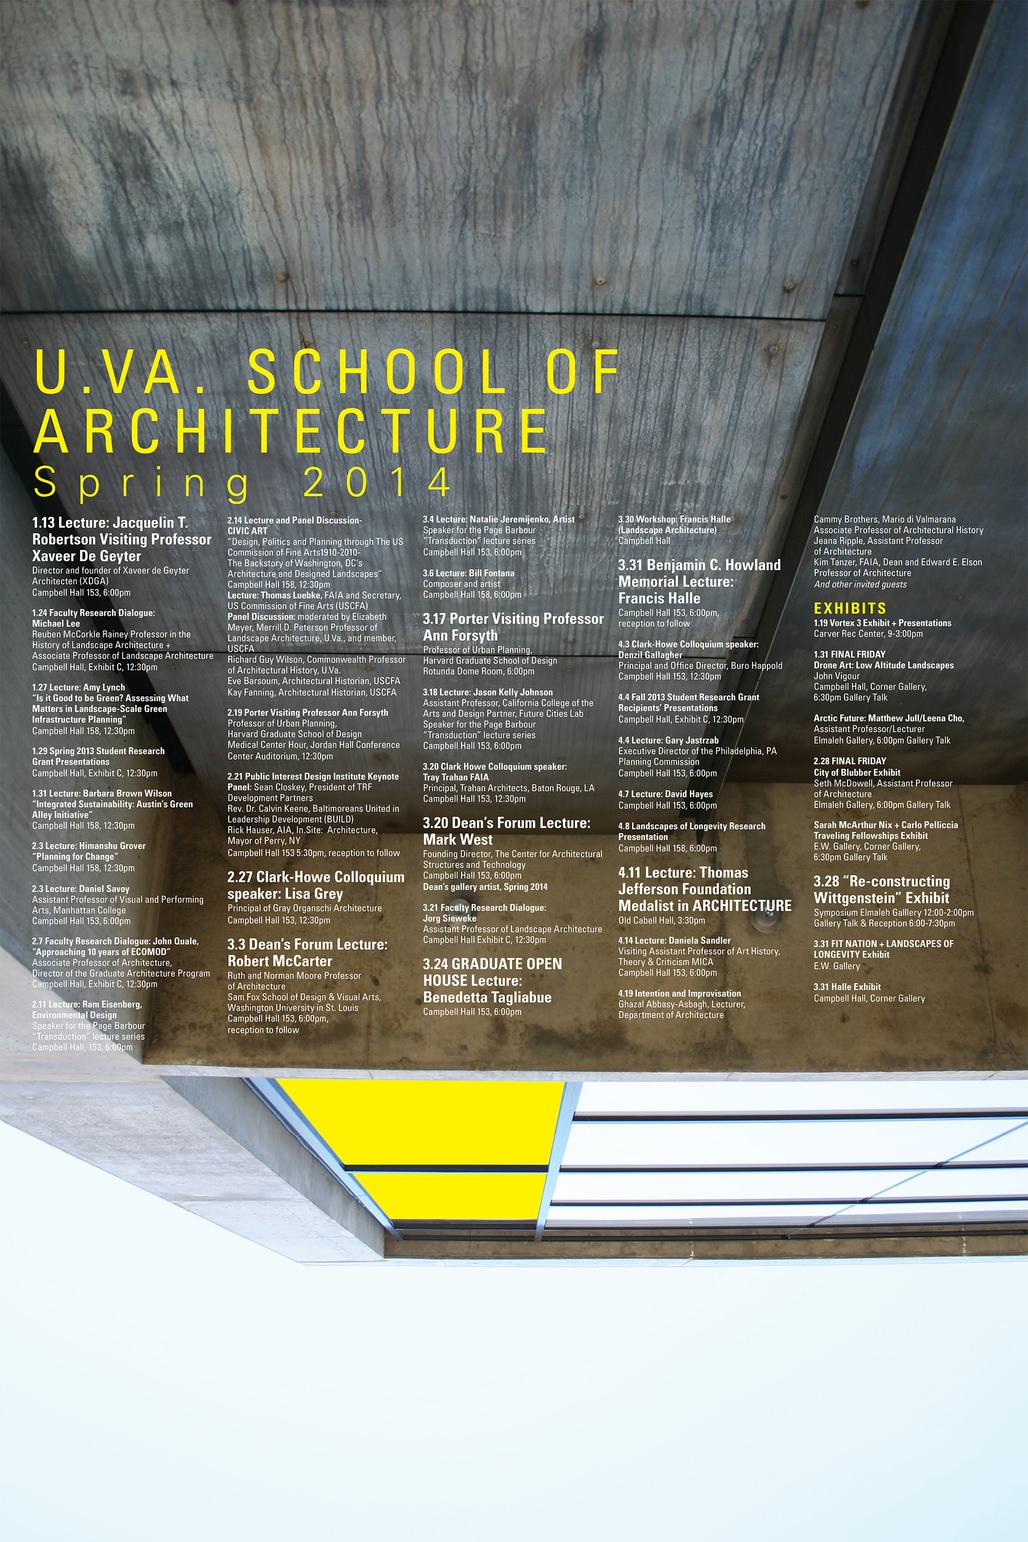 U.VA Spring '14 Lecture Events. Image courtesy of U.VA School of Architecture.